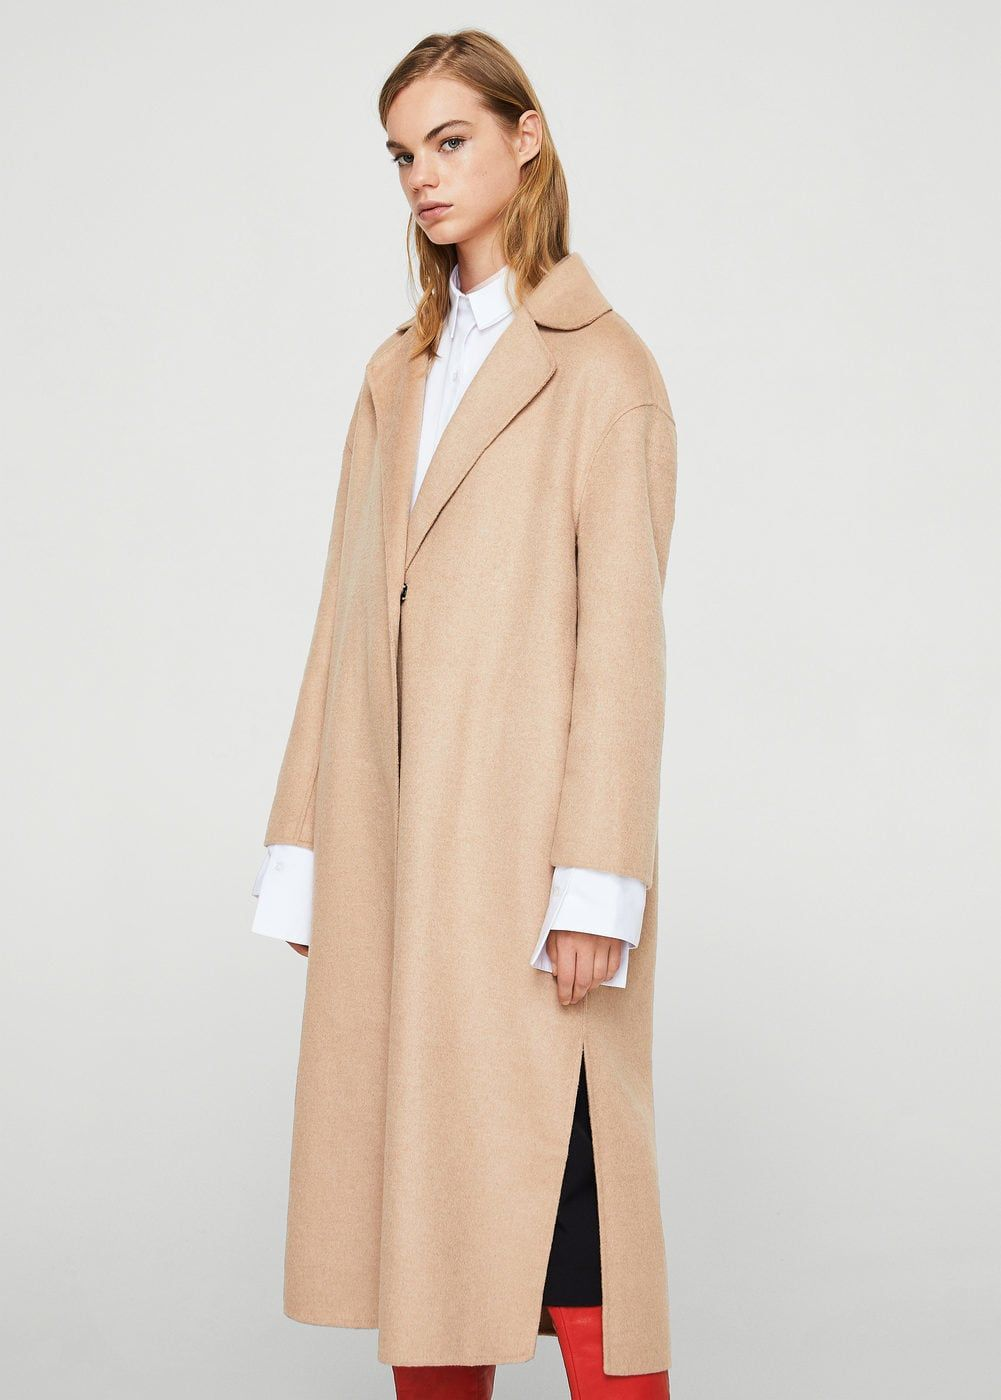 Wool handmade coat Women | Coats for women, Coat, Wool coat